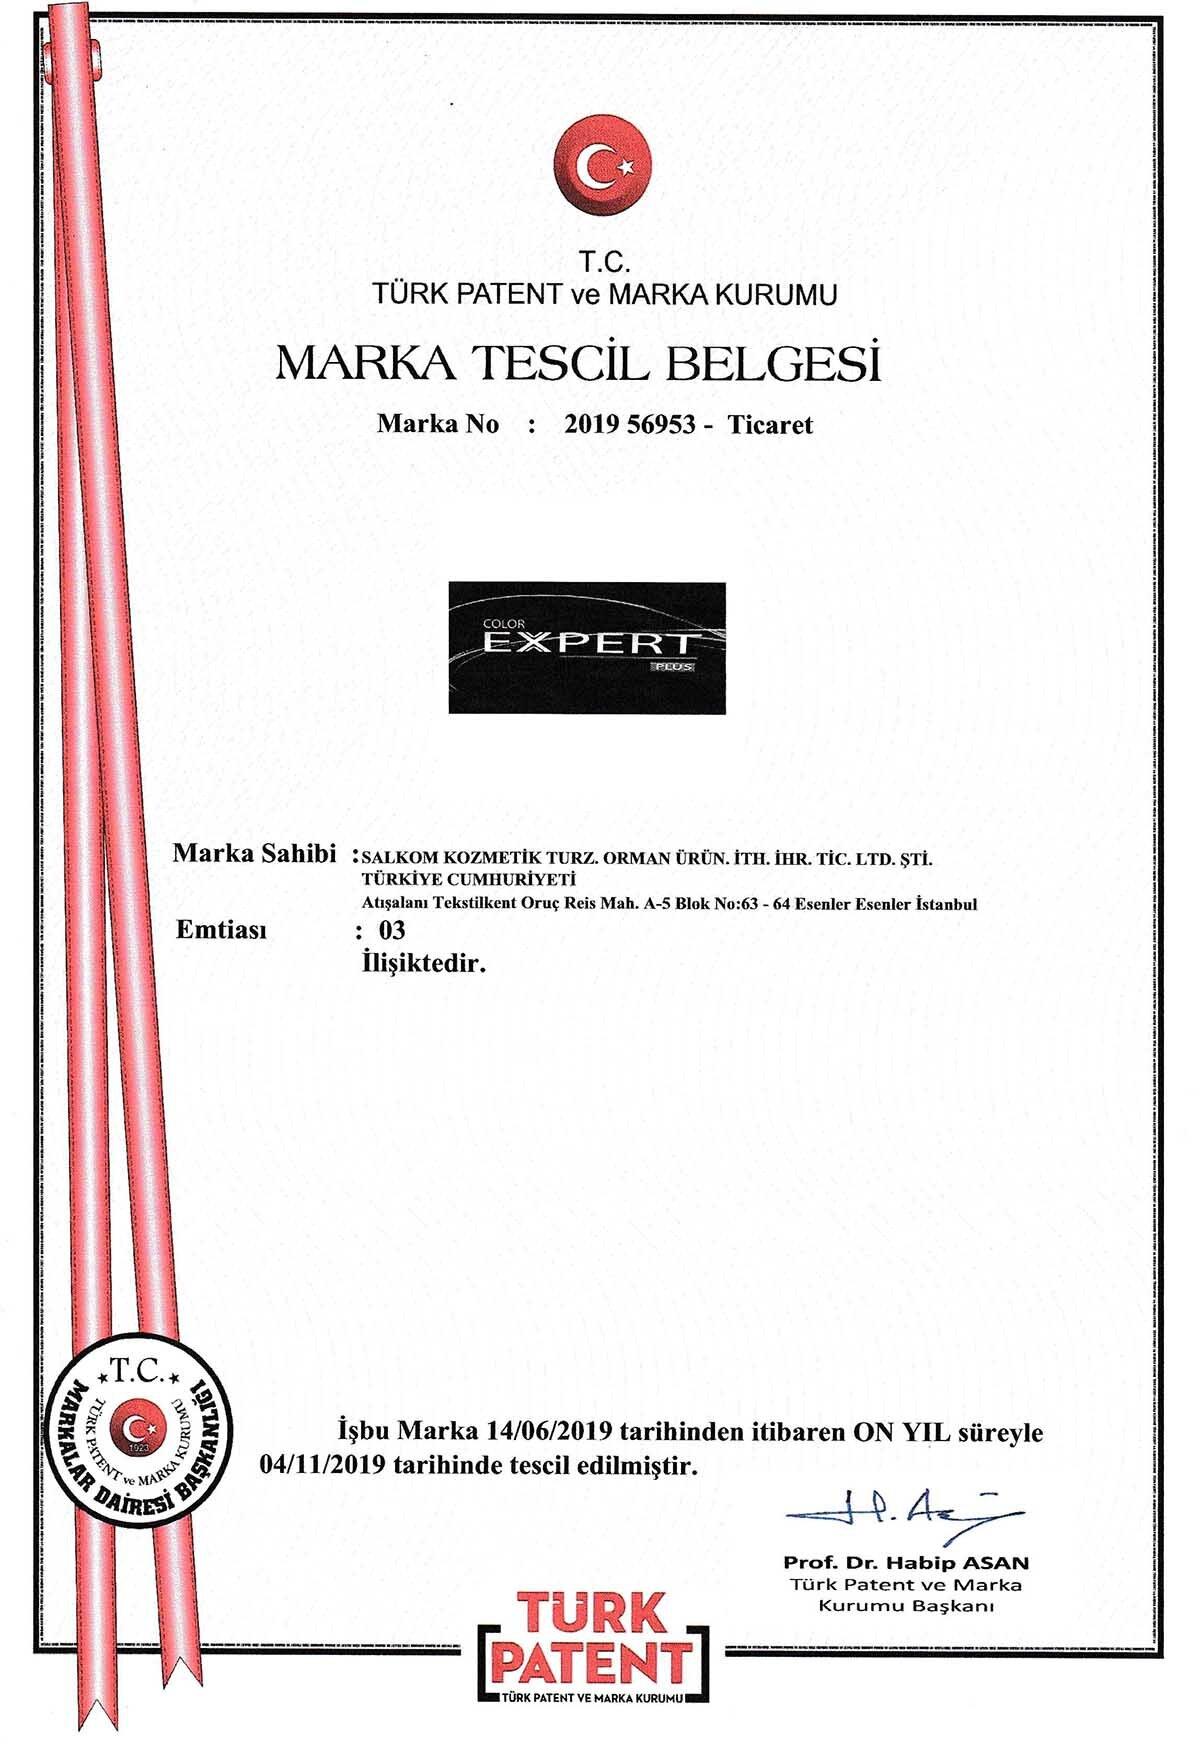 EXPERT PLUS MARKA TESCİL